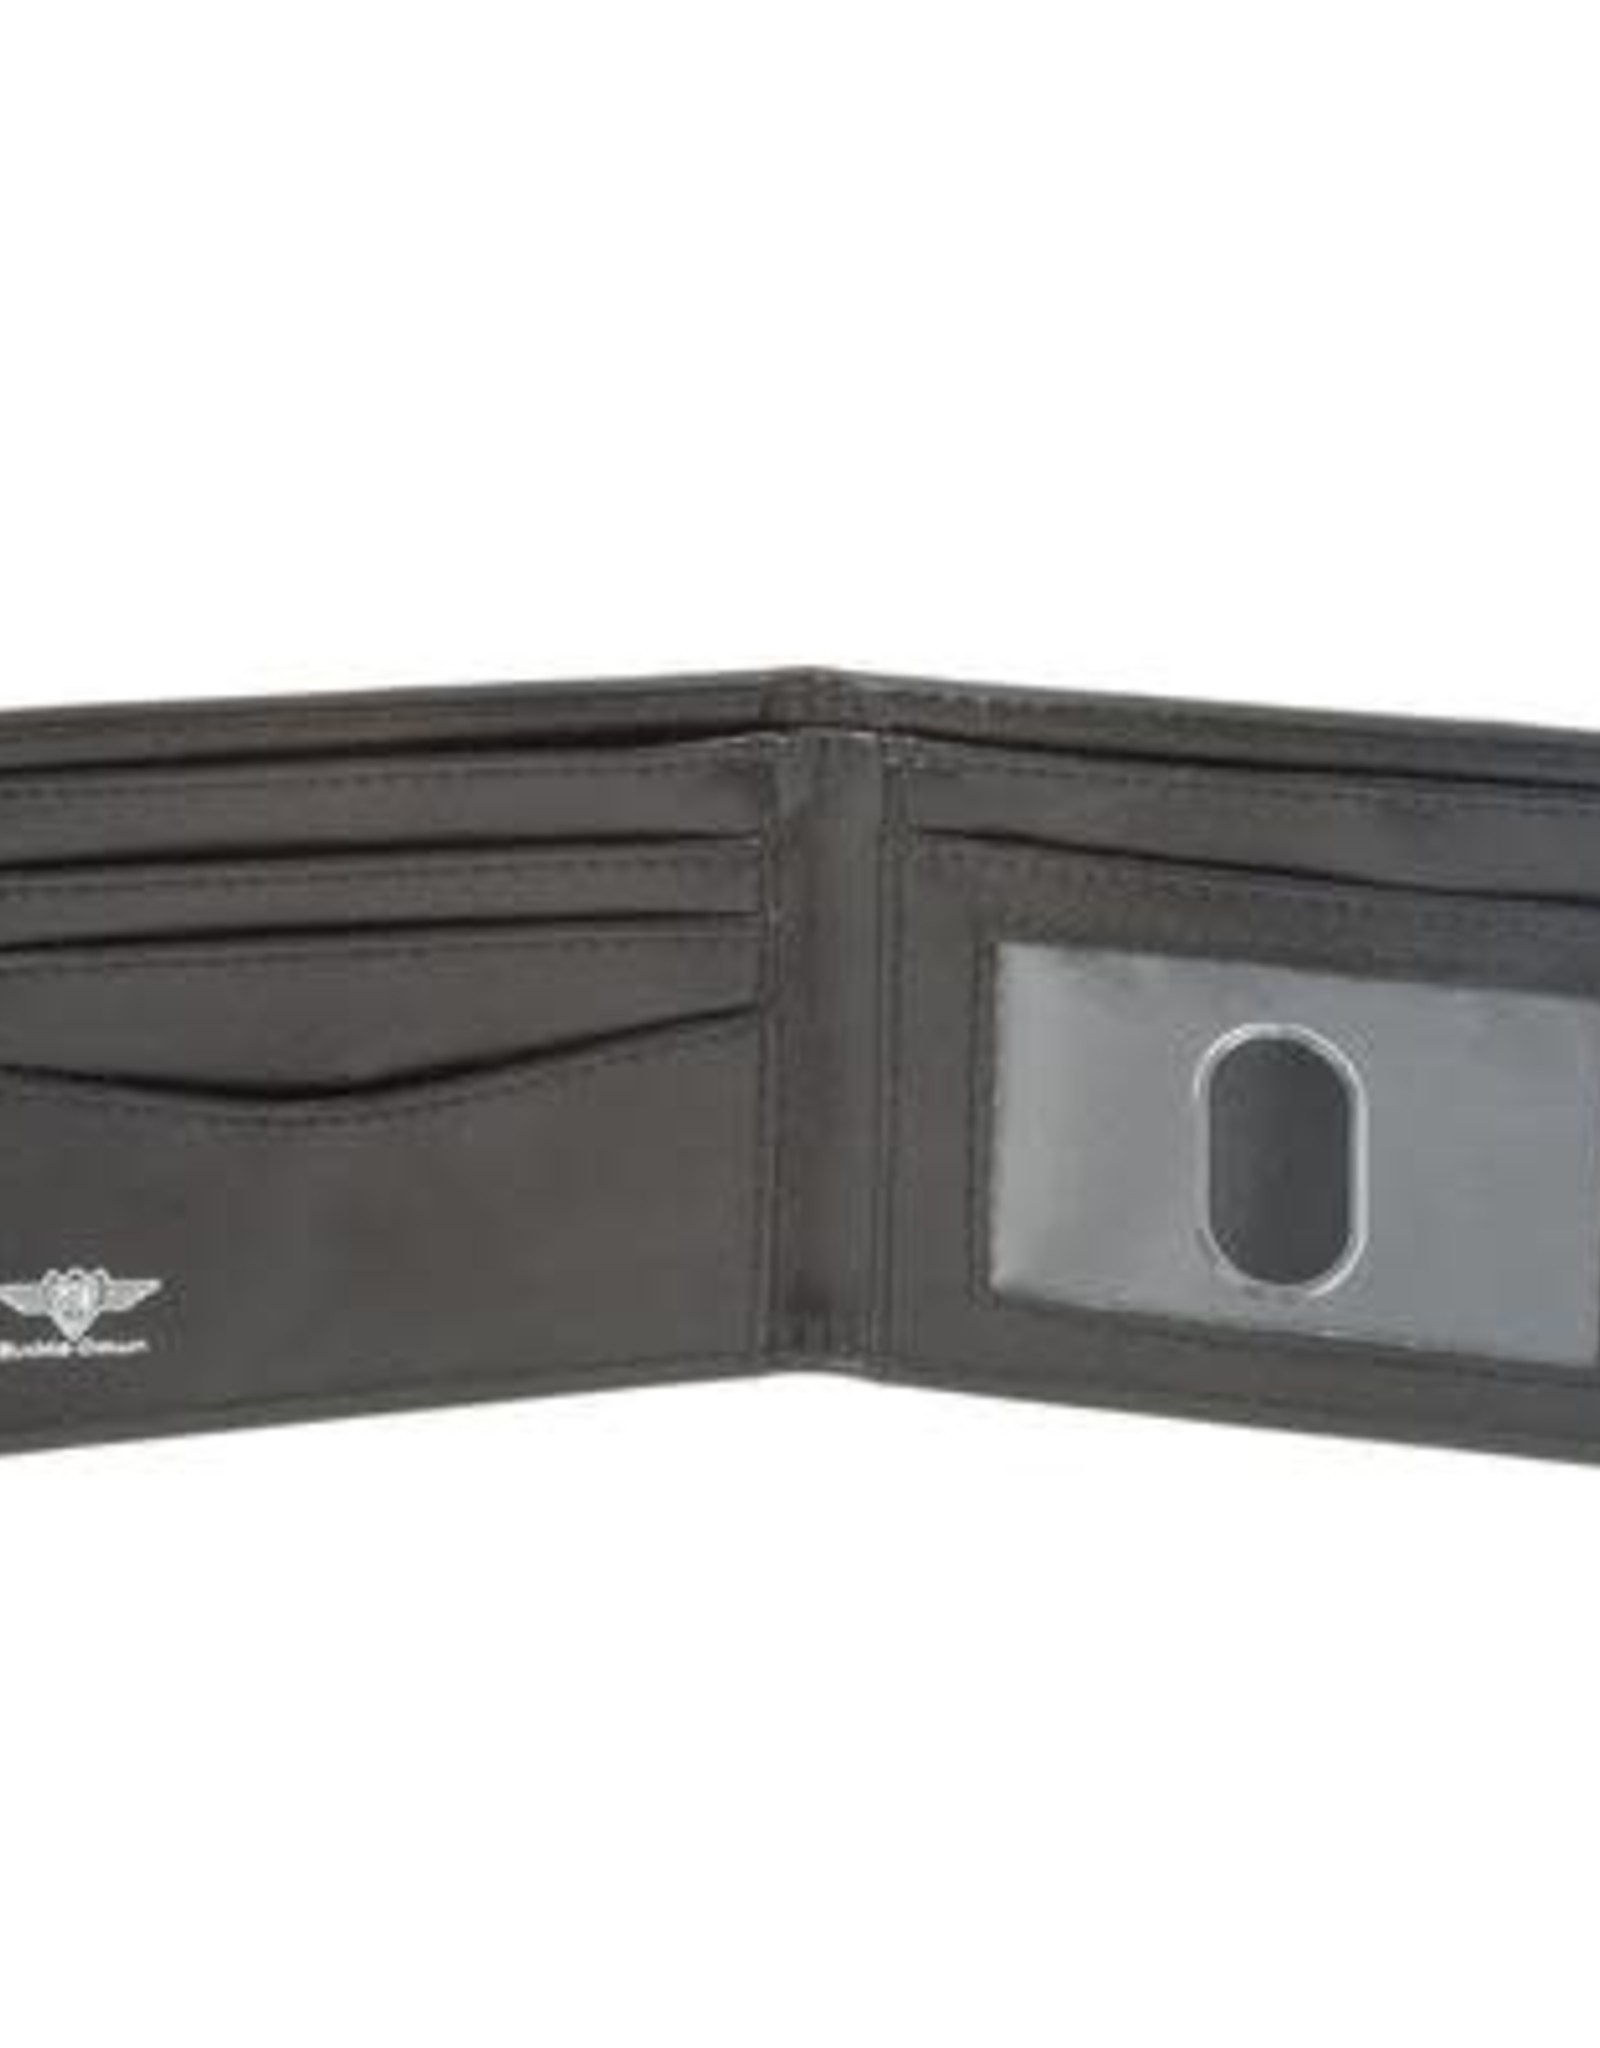 Buckle Down Belts Robot Checkered Bi-Fold Vinyl Wallet - Black/White